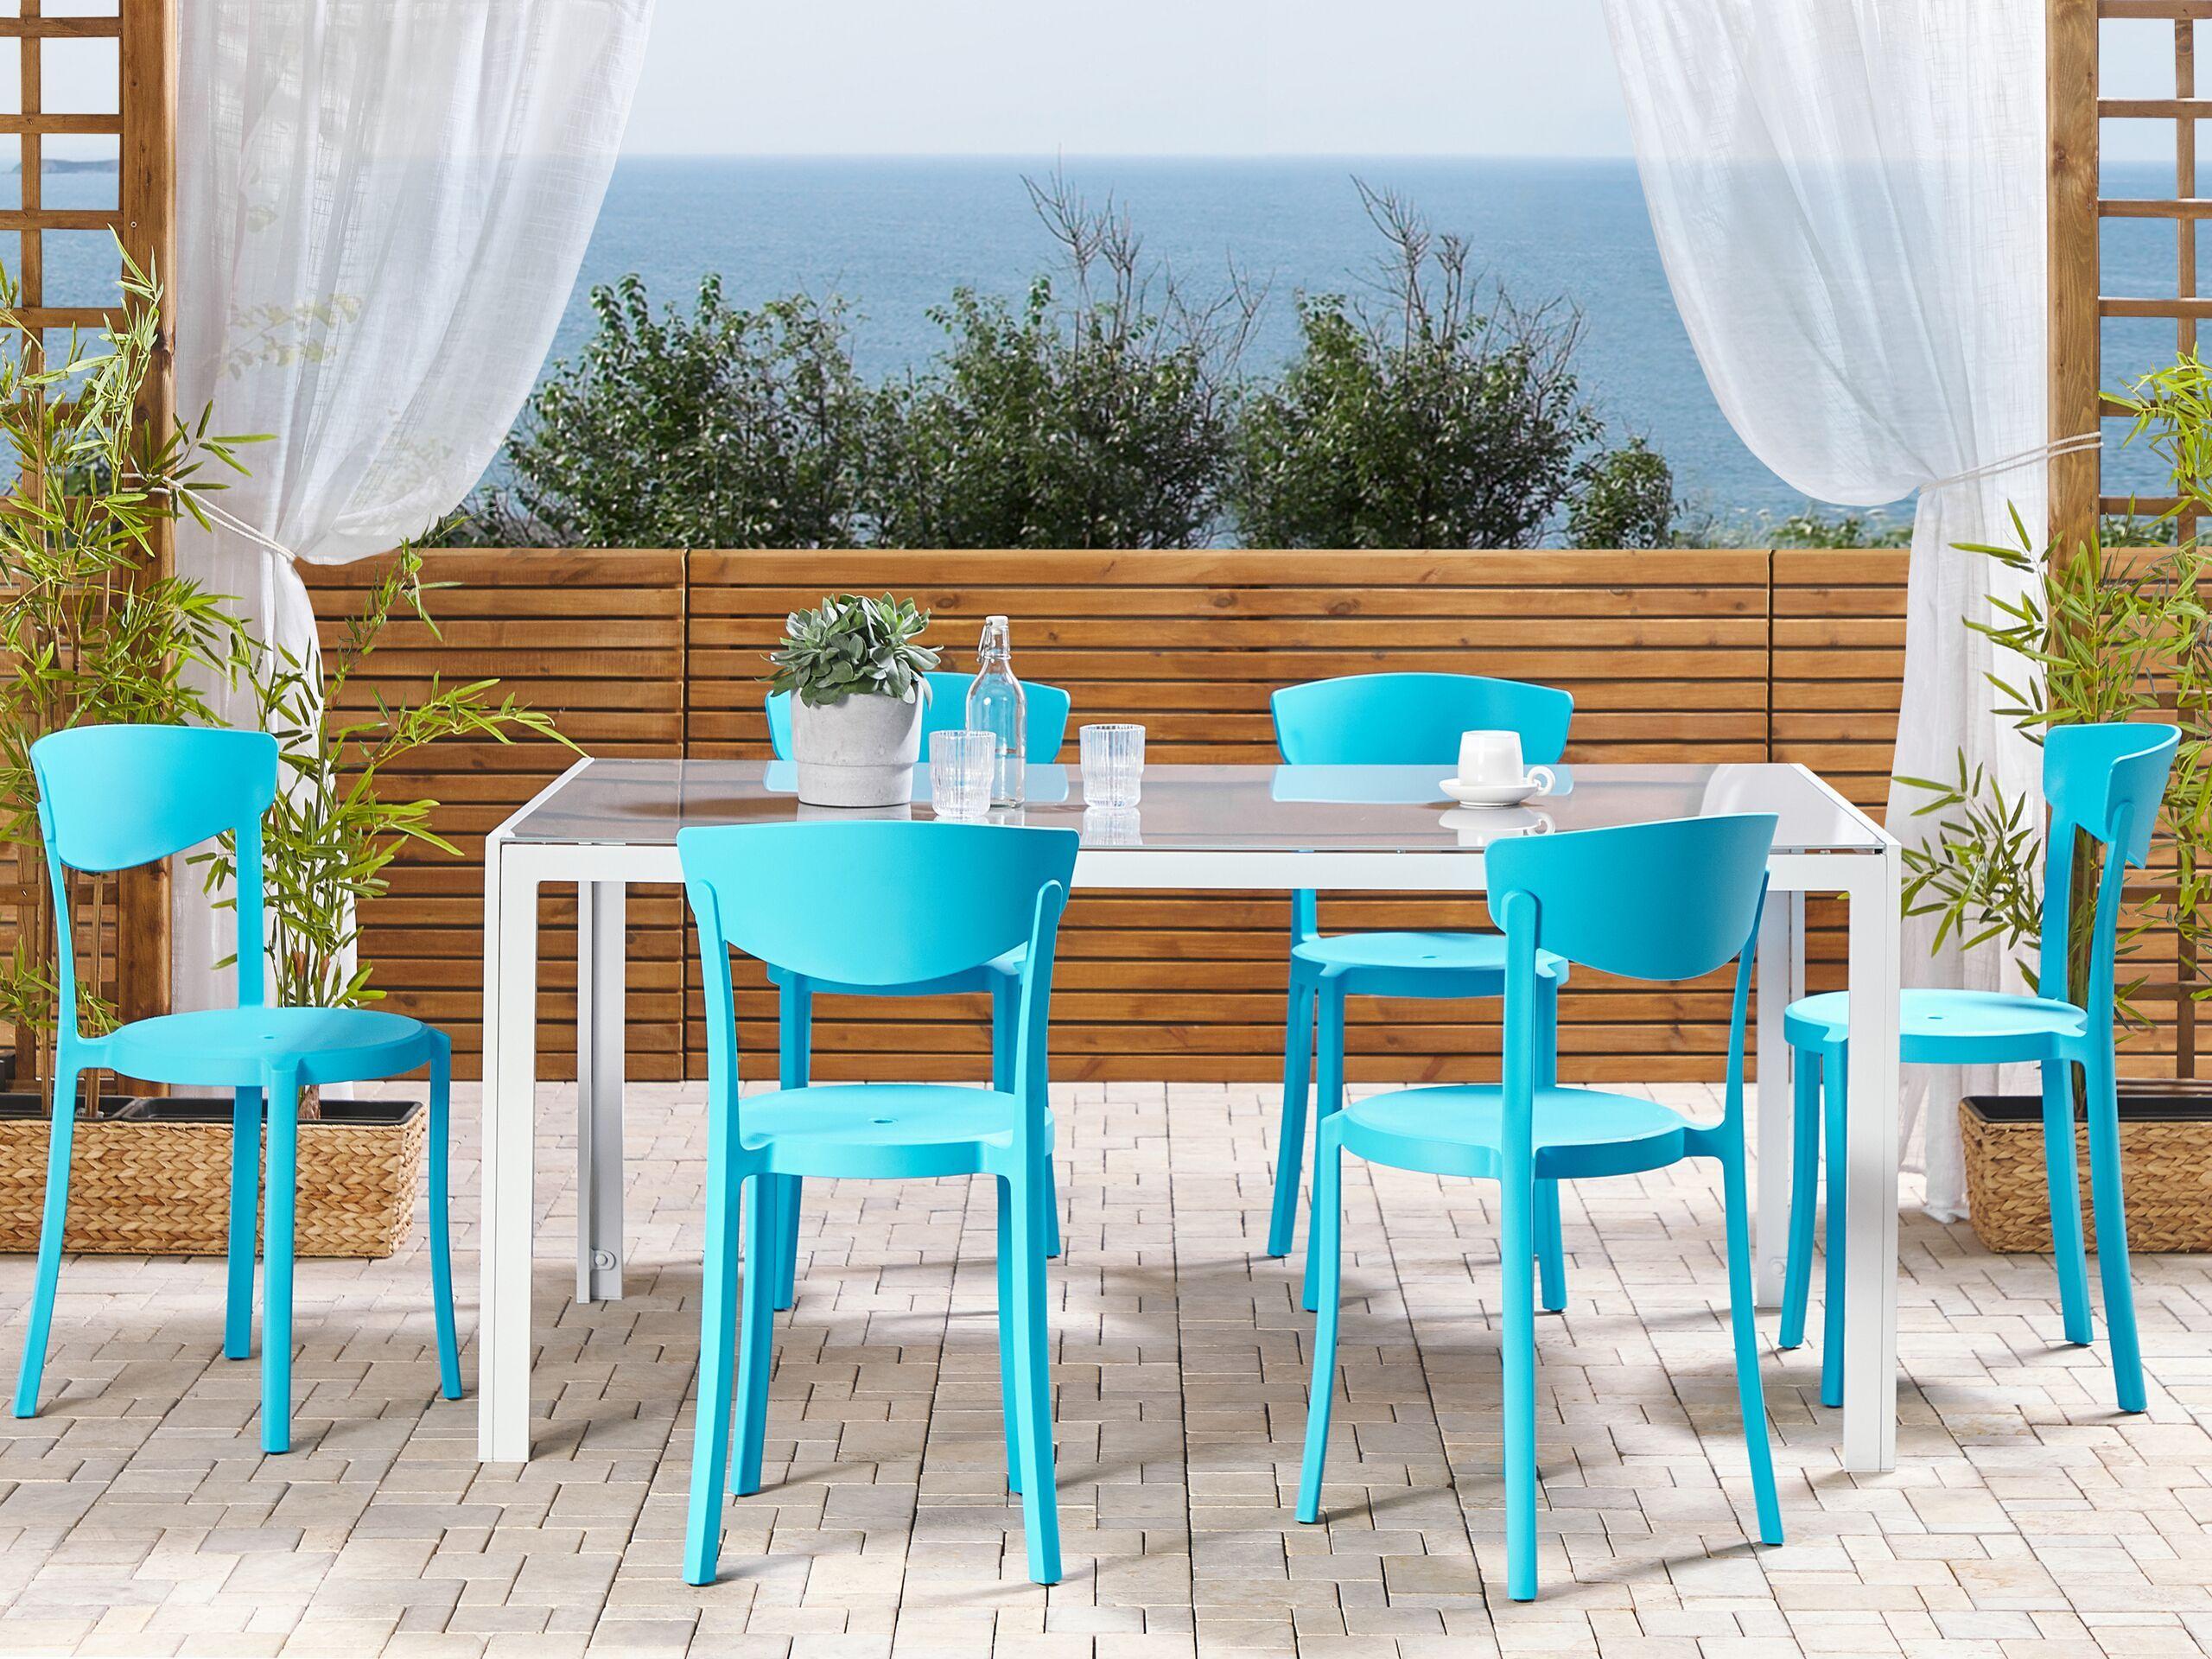 beliani set di 6 sedie moderne da esterno e interno in plastica blu